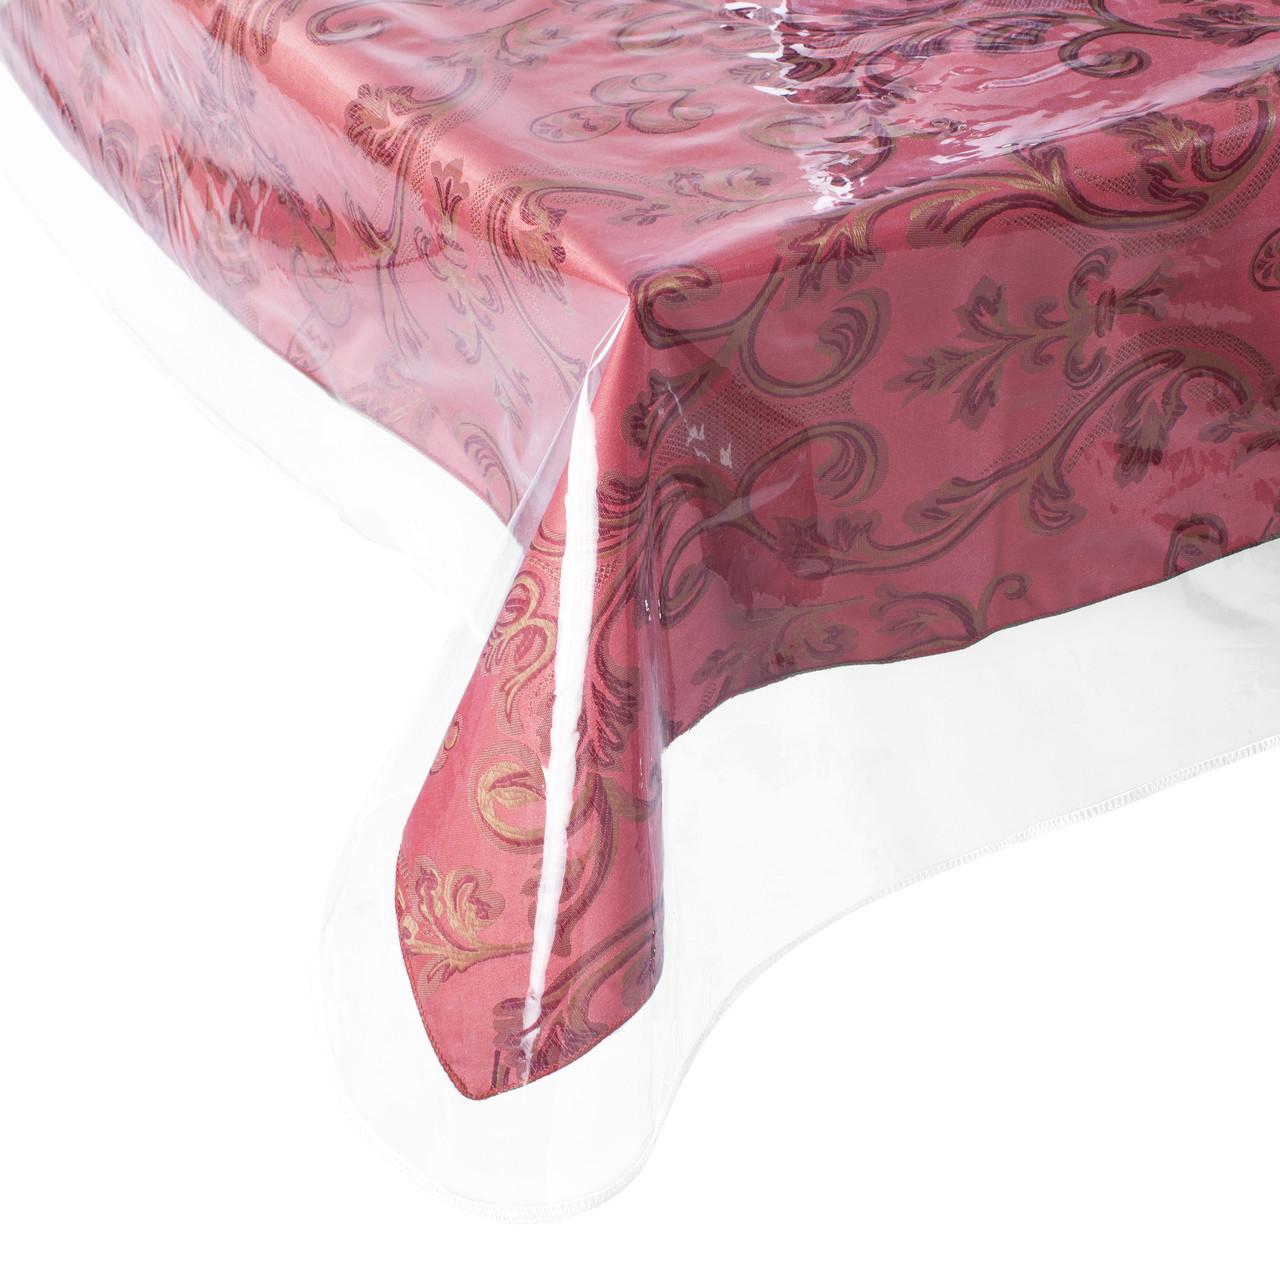 Heavy Duty Clear Vinyl Tablecloth Yourtablecloth